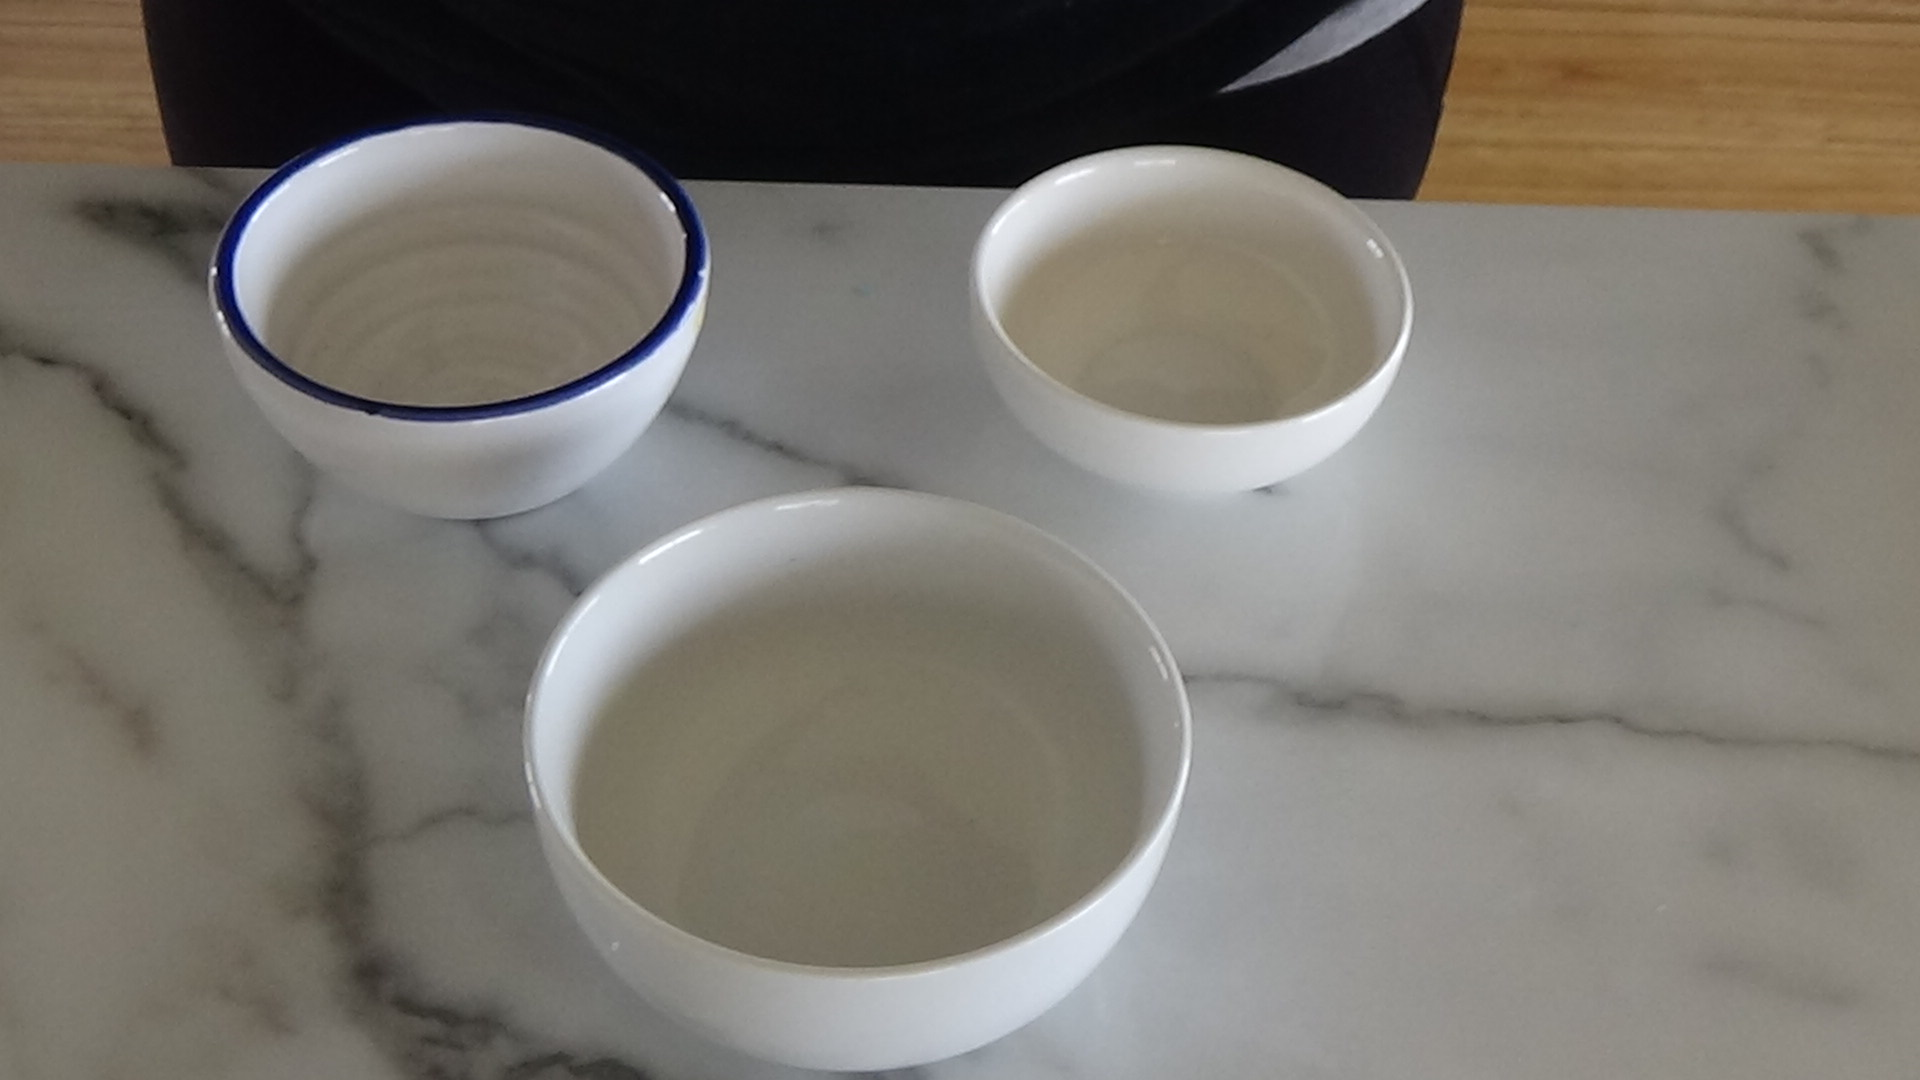 Ceramic bowls on countertop.